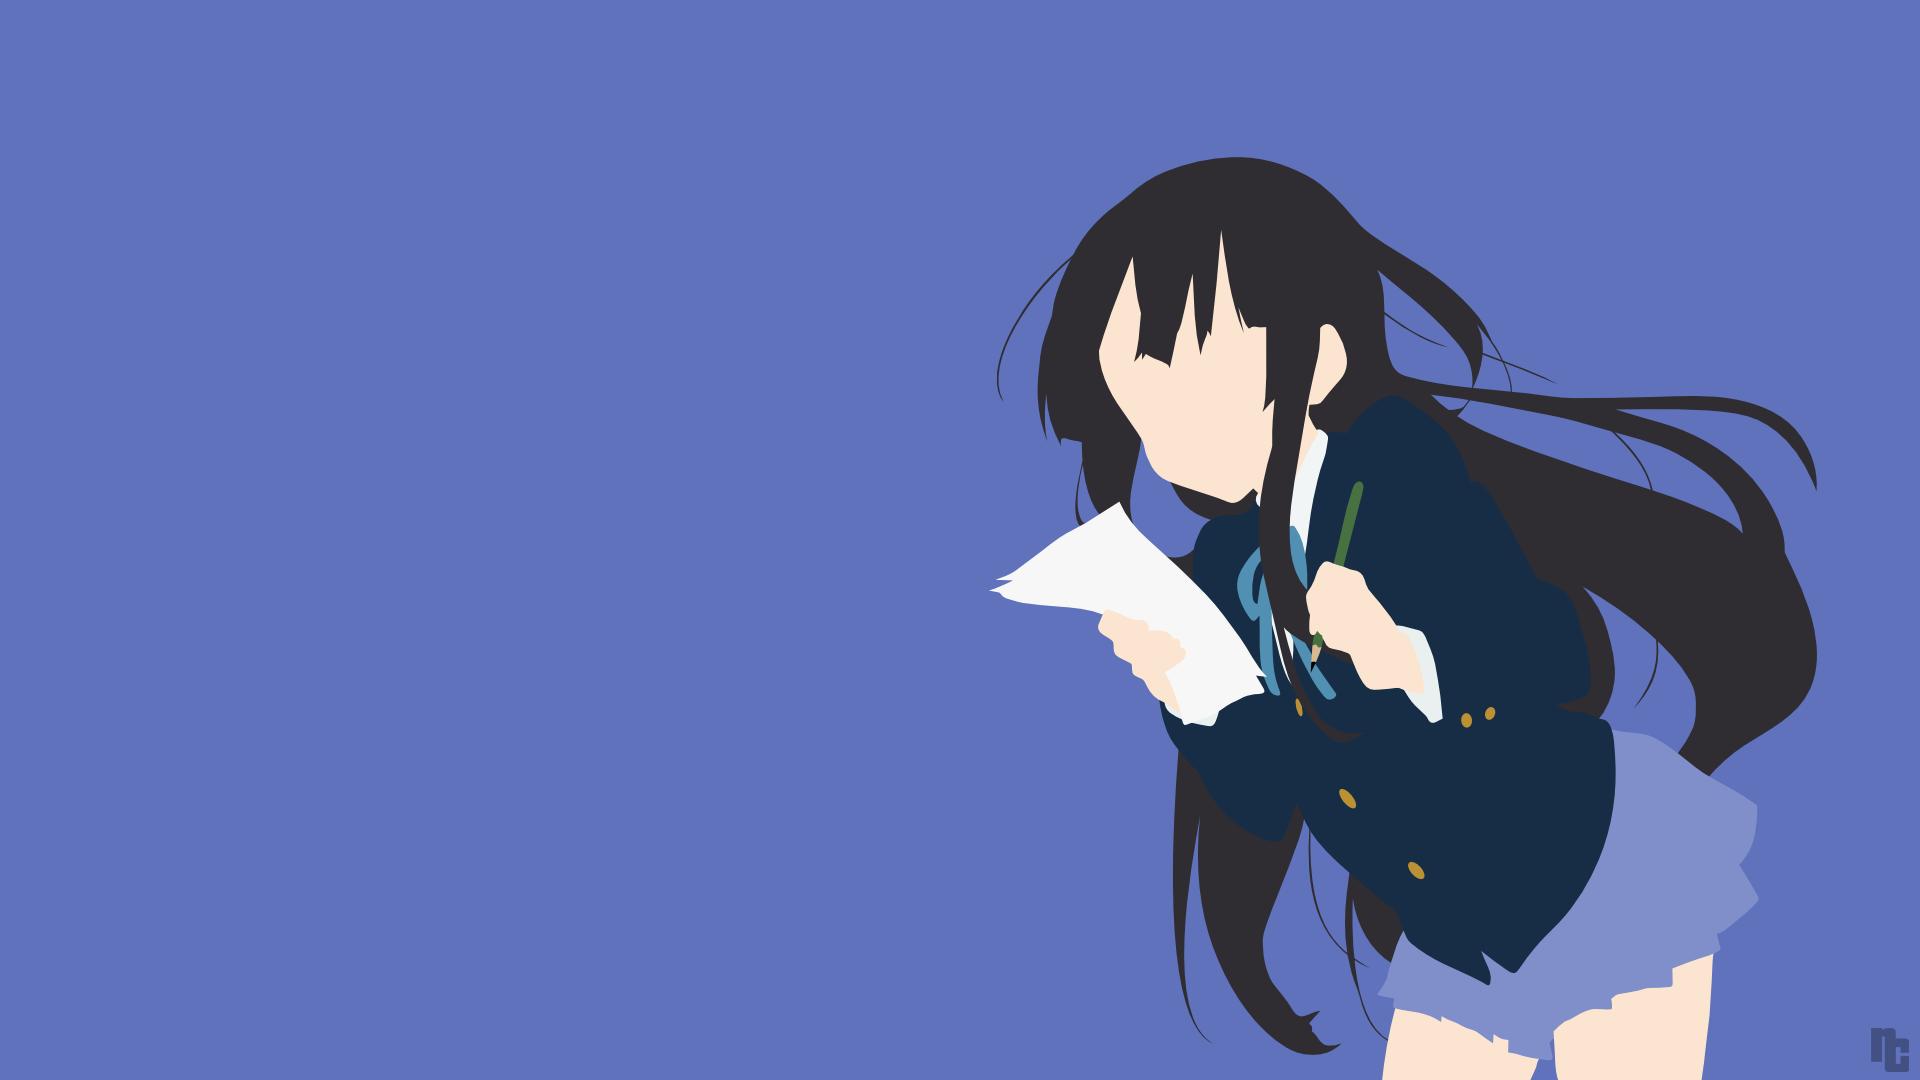 Mio K On Minimalist Wallpaper Anime Animacion Kirara